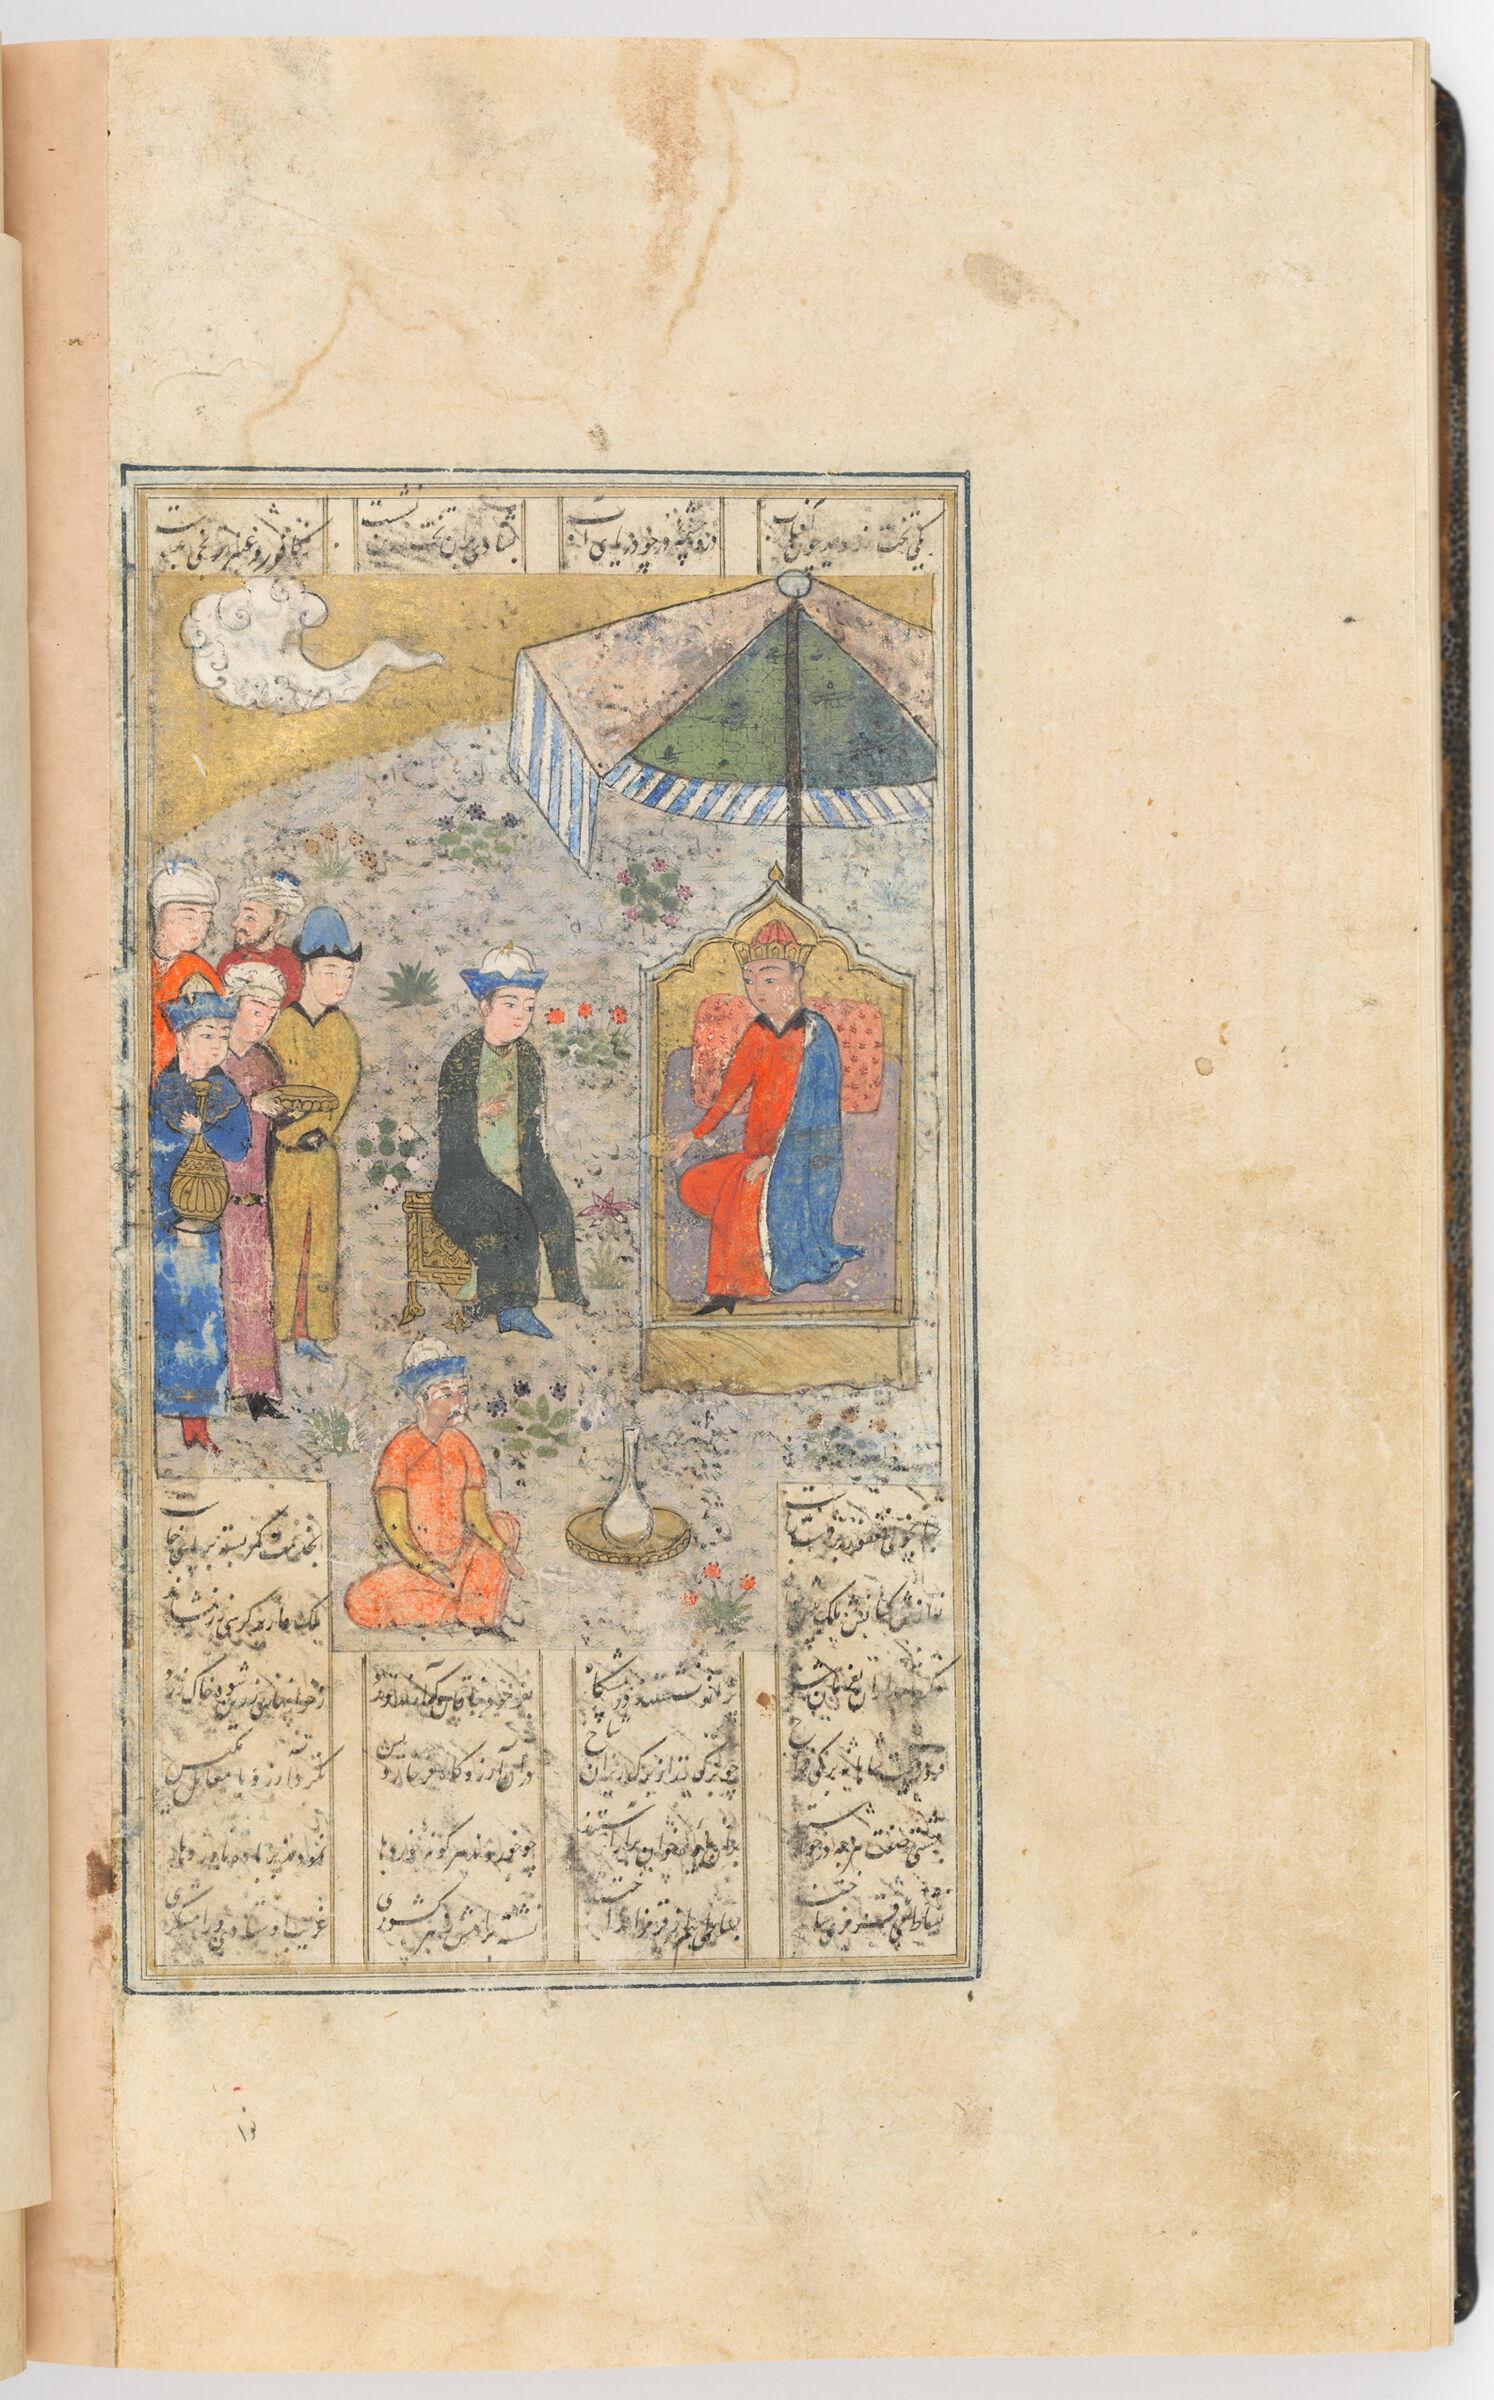 Khaqan Of Chin Invites Iskandar (Text Recto; Painting Verso Of Folio 313), Painting From A Manuscript Of The Khamsa By Nizami